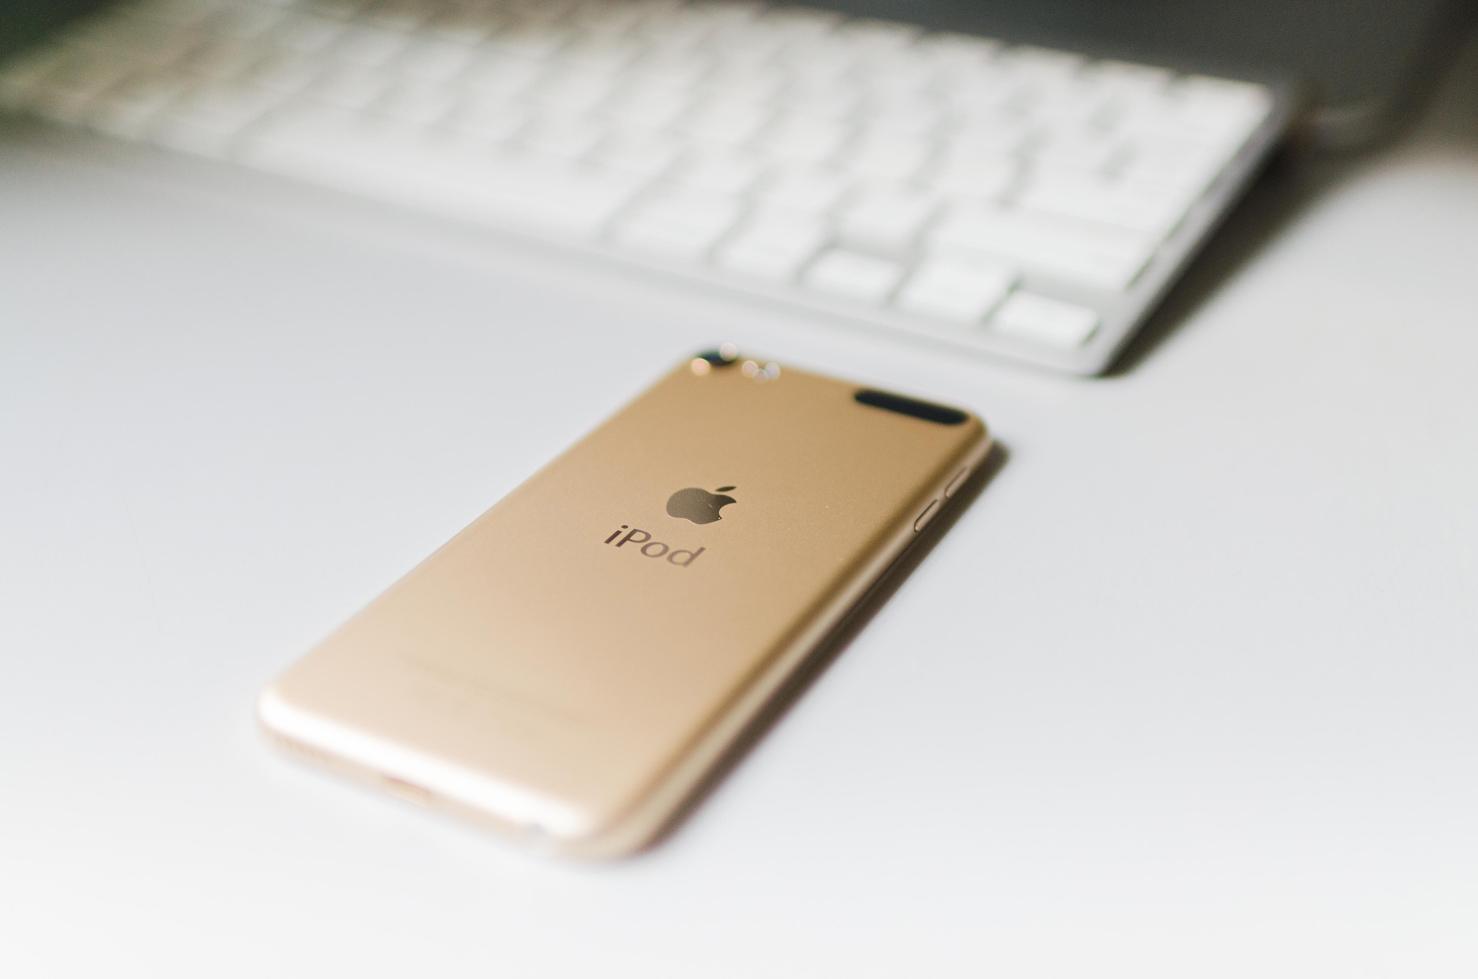 ipod-product-50mm-nikon